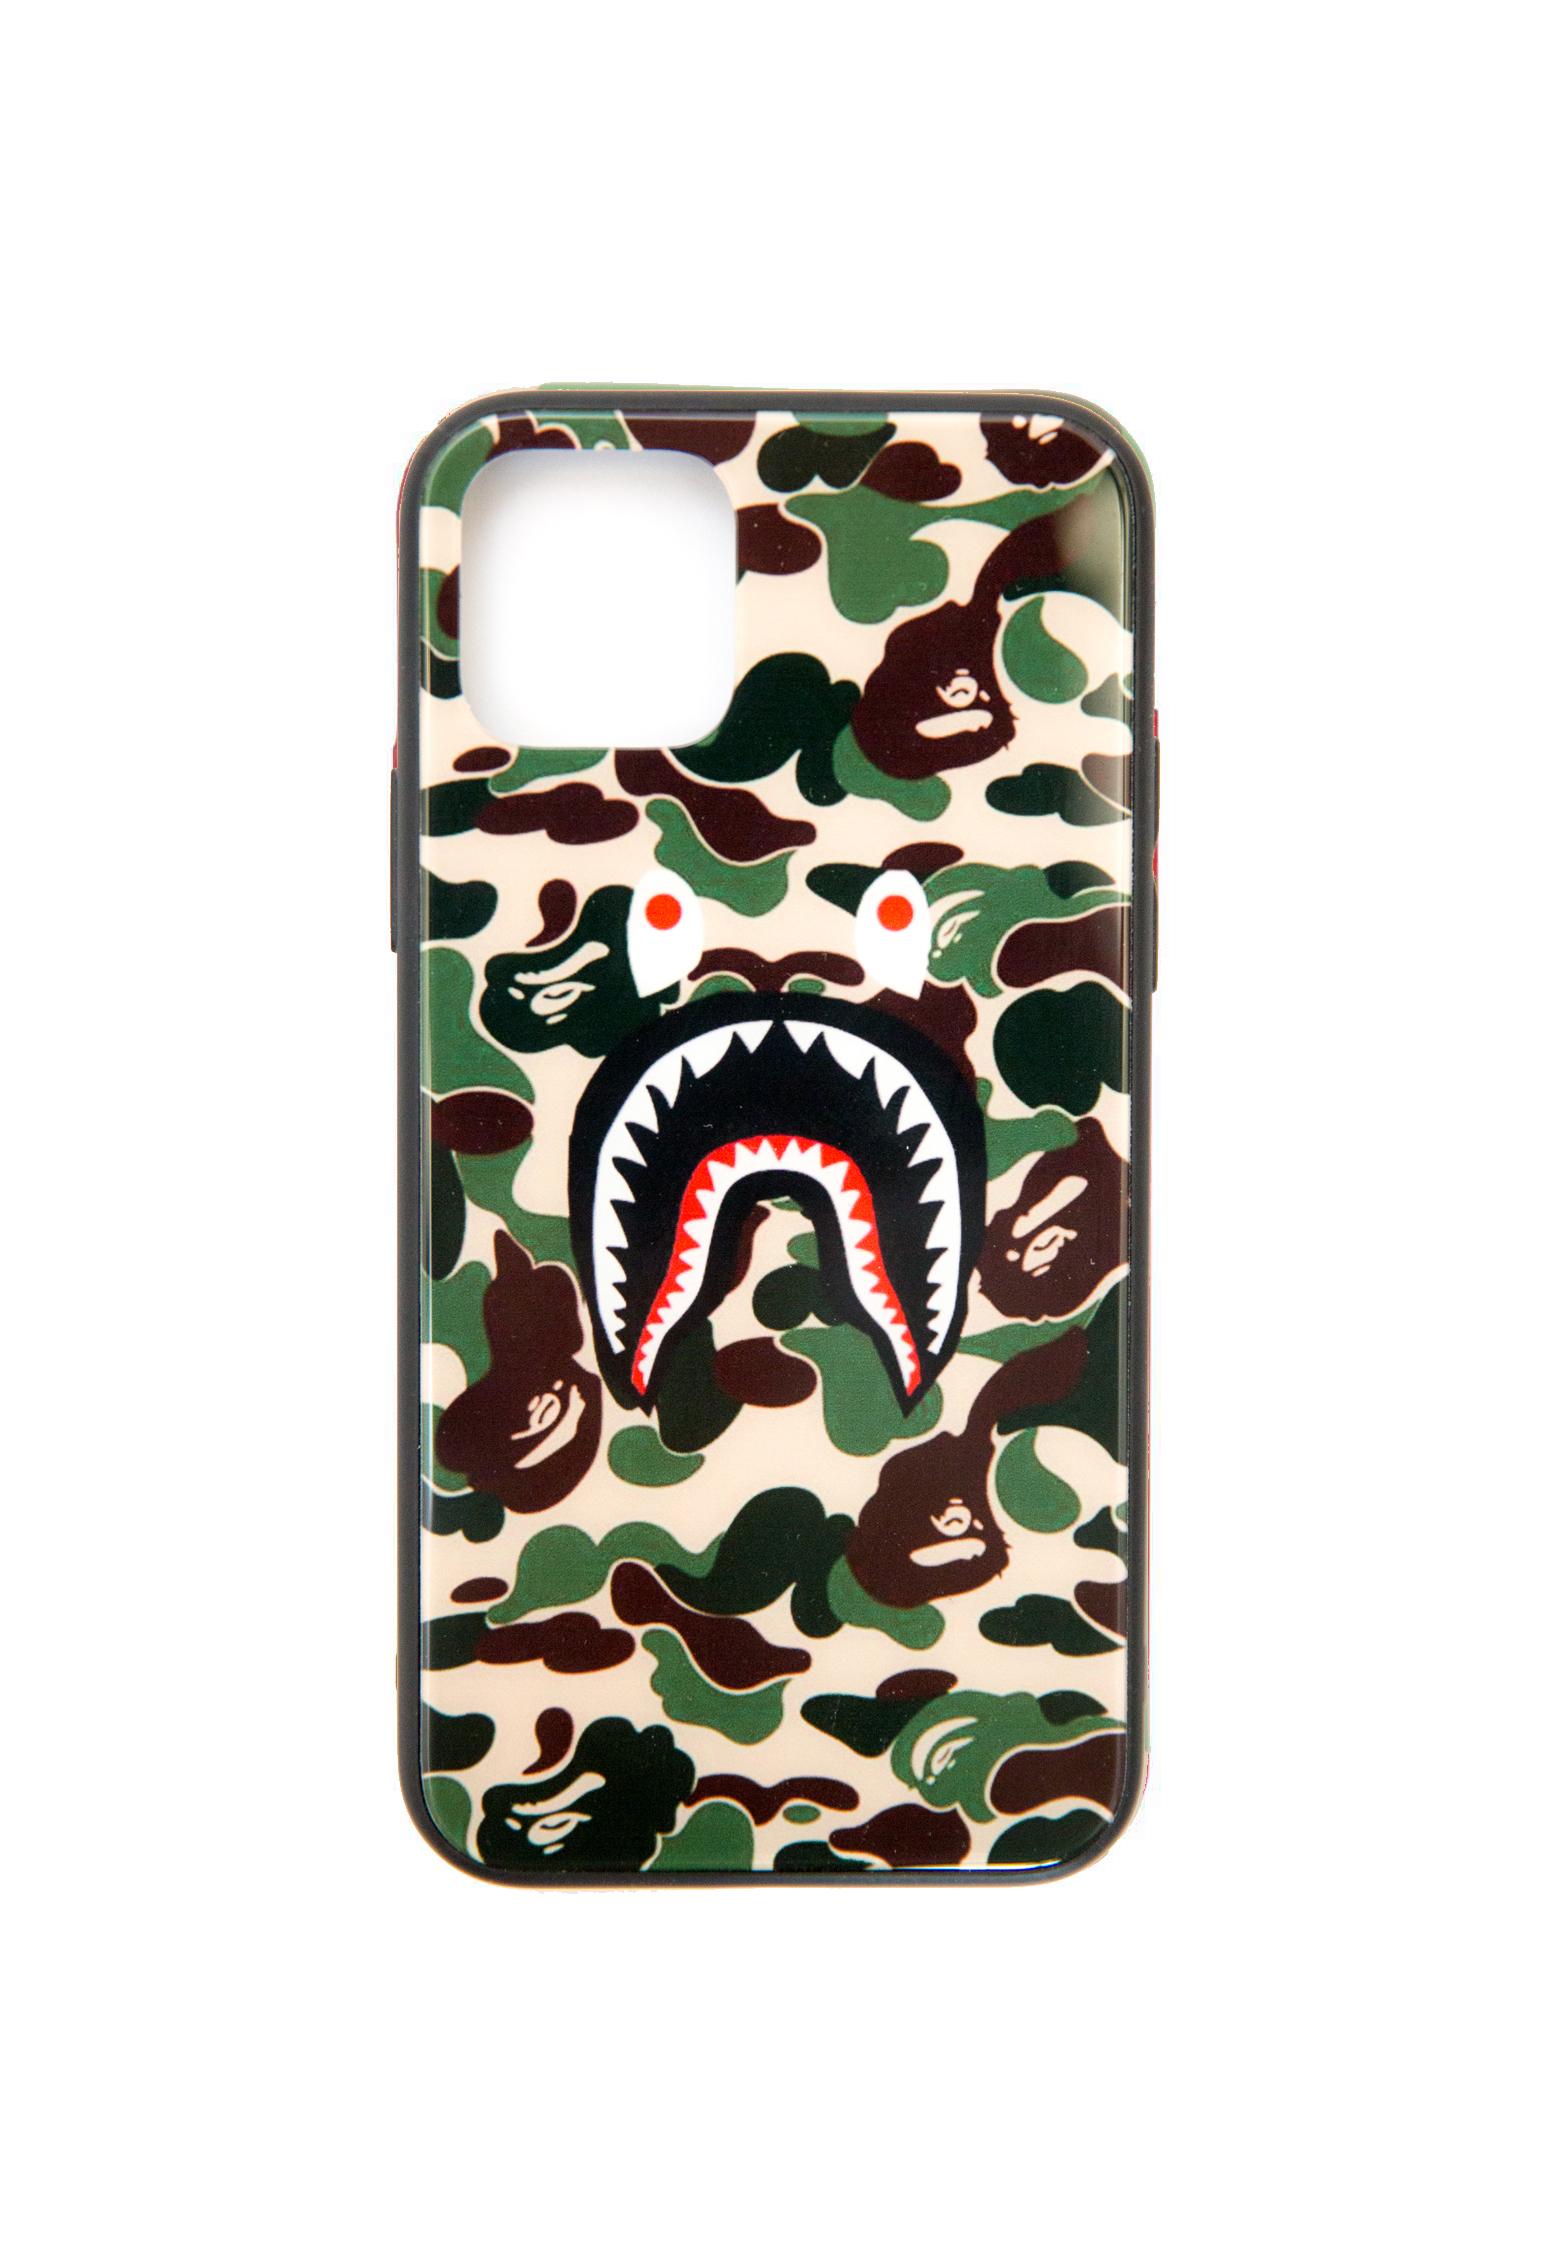 Shark Bape Camo Army iPhone Case 11 pro